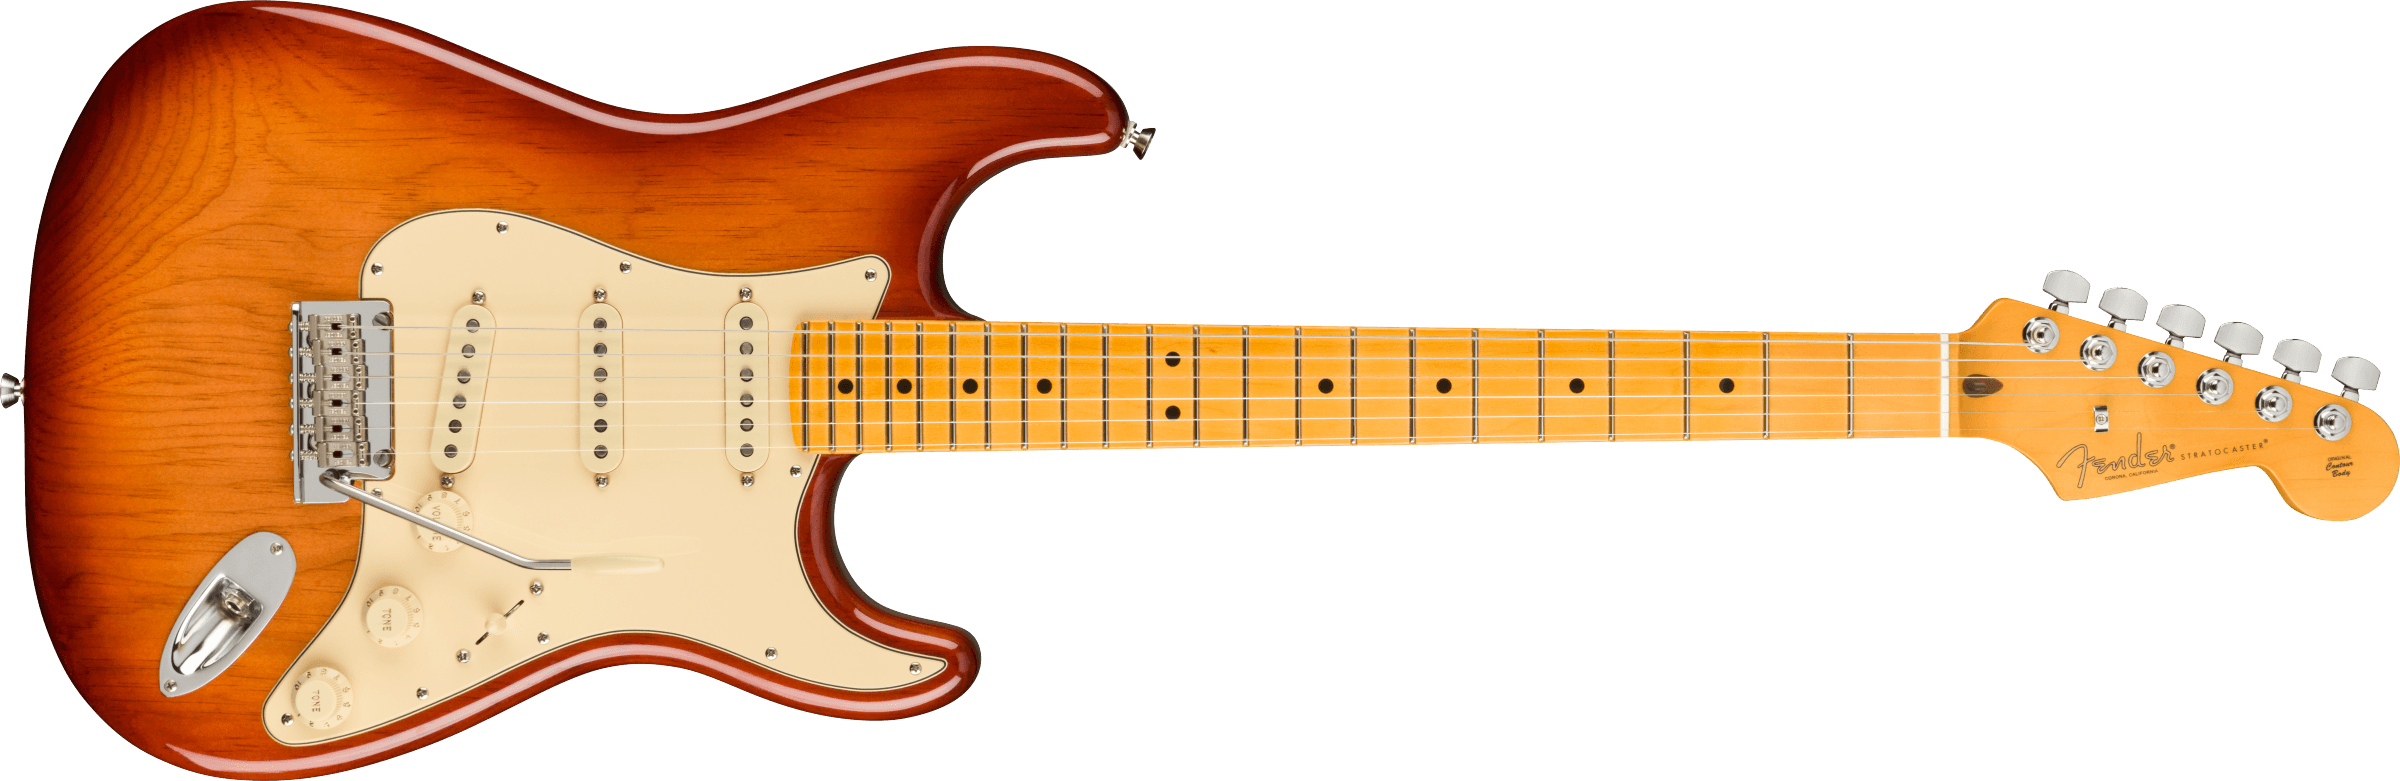 FENDER-American-Professional-II-Stratocaster-Maple-Fingerboard-Sienna-Sunburst-sku-571005521